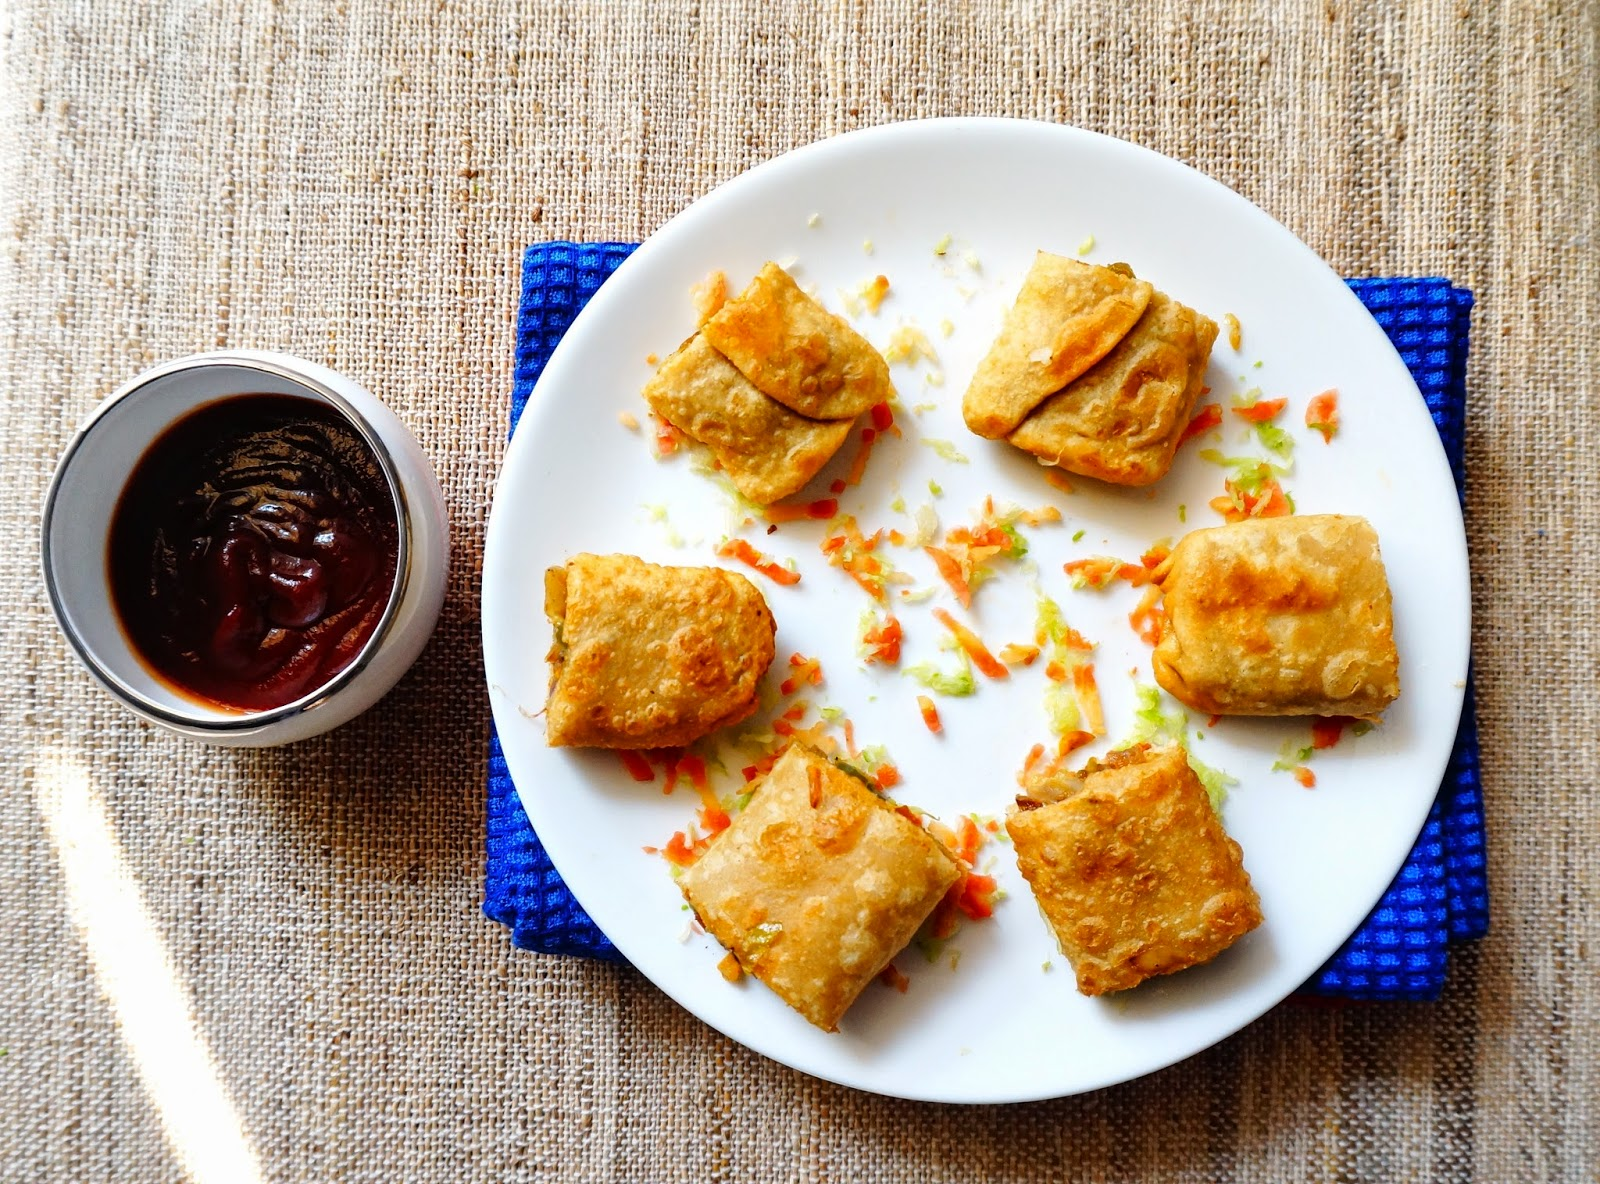 Kathi Rolls,wraps, Frankie, chapati,chapati rolls,roti